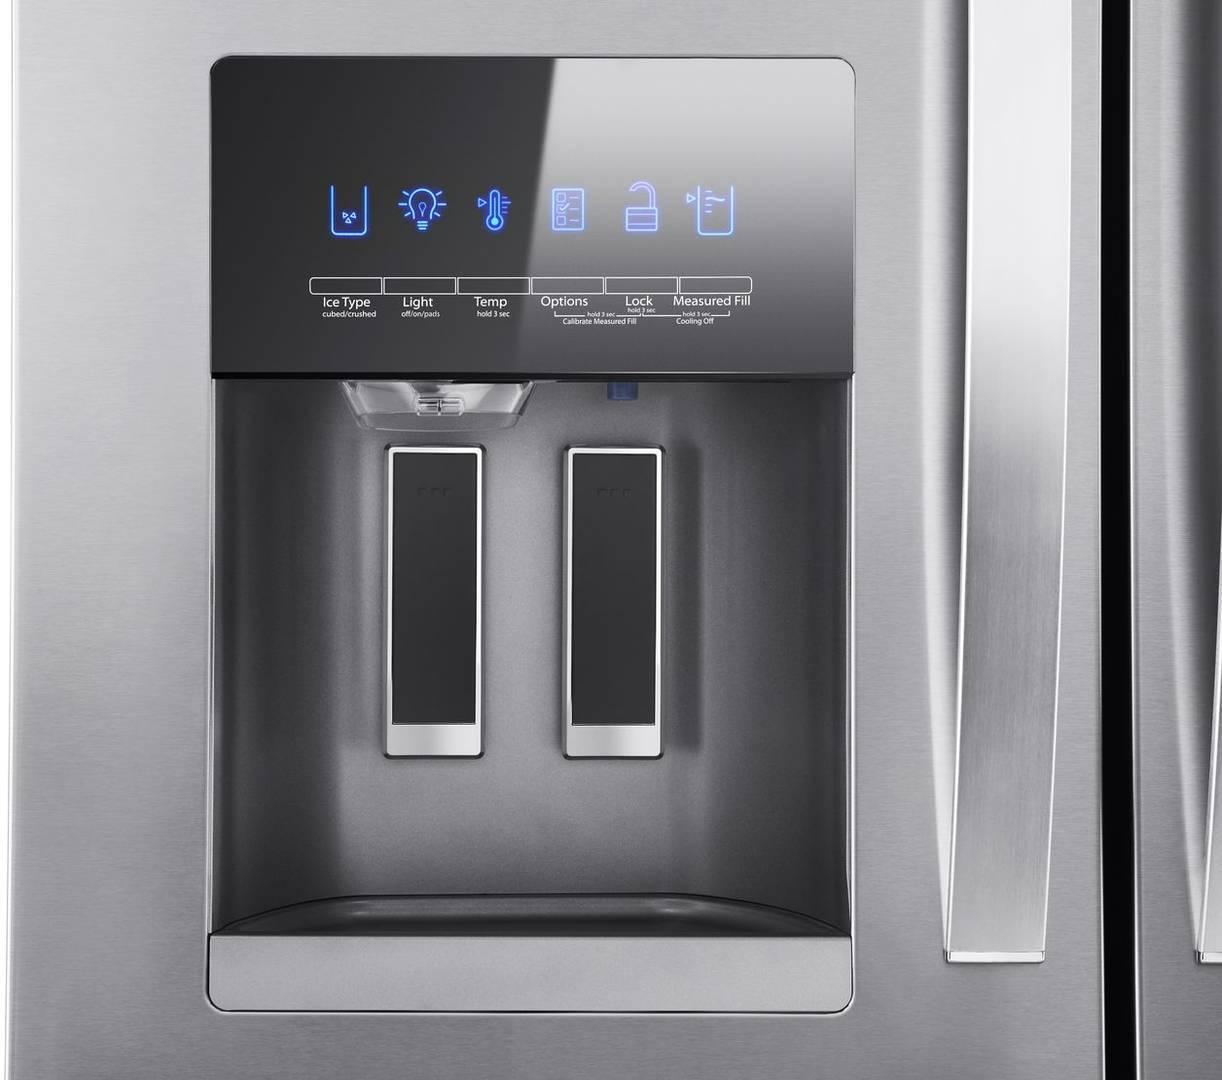 Wrx735sdhb Whirlpool Wrx735sdhb French Door Refrigerators